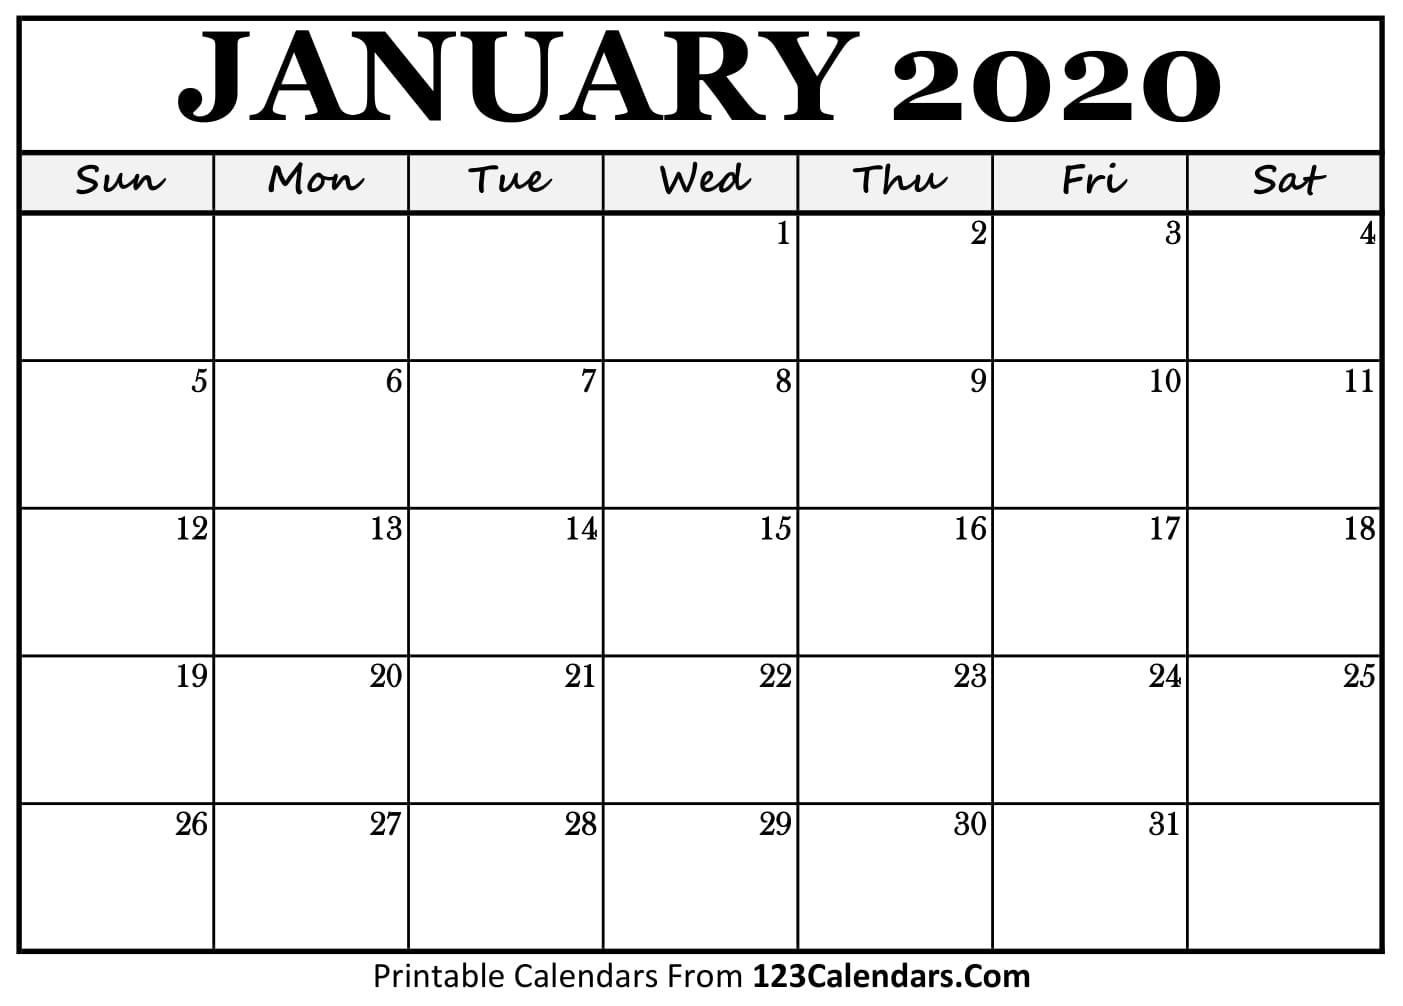 Free Printable Calendar | 123Calendars in Empty Printable Calendar